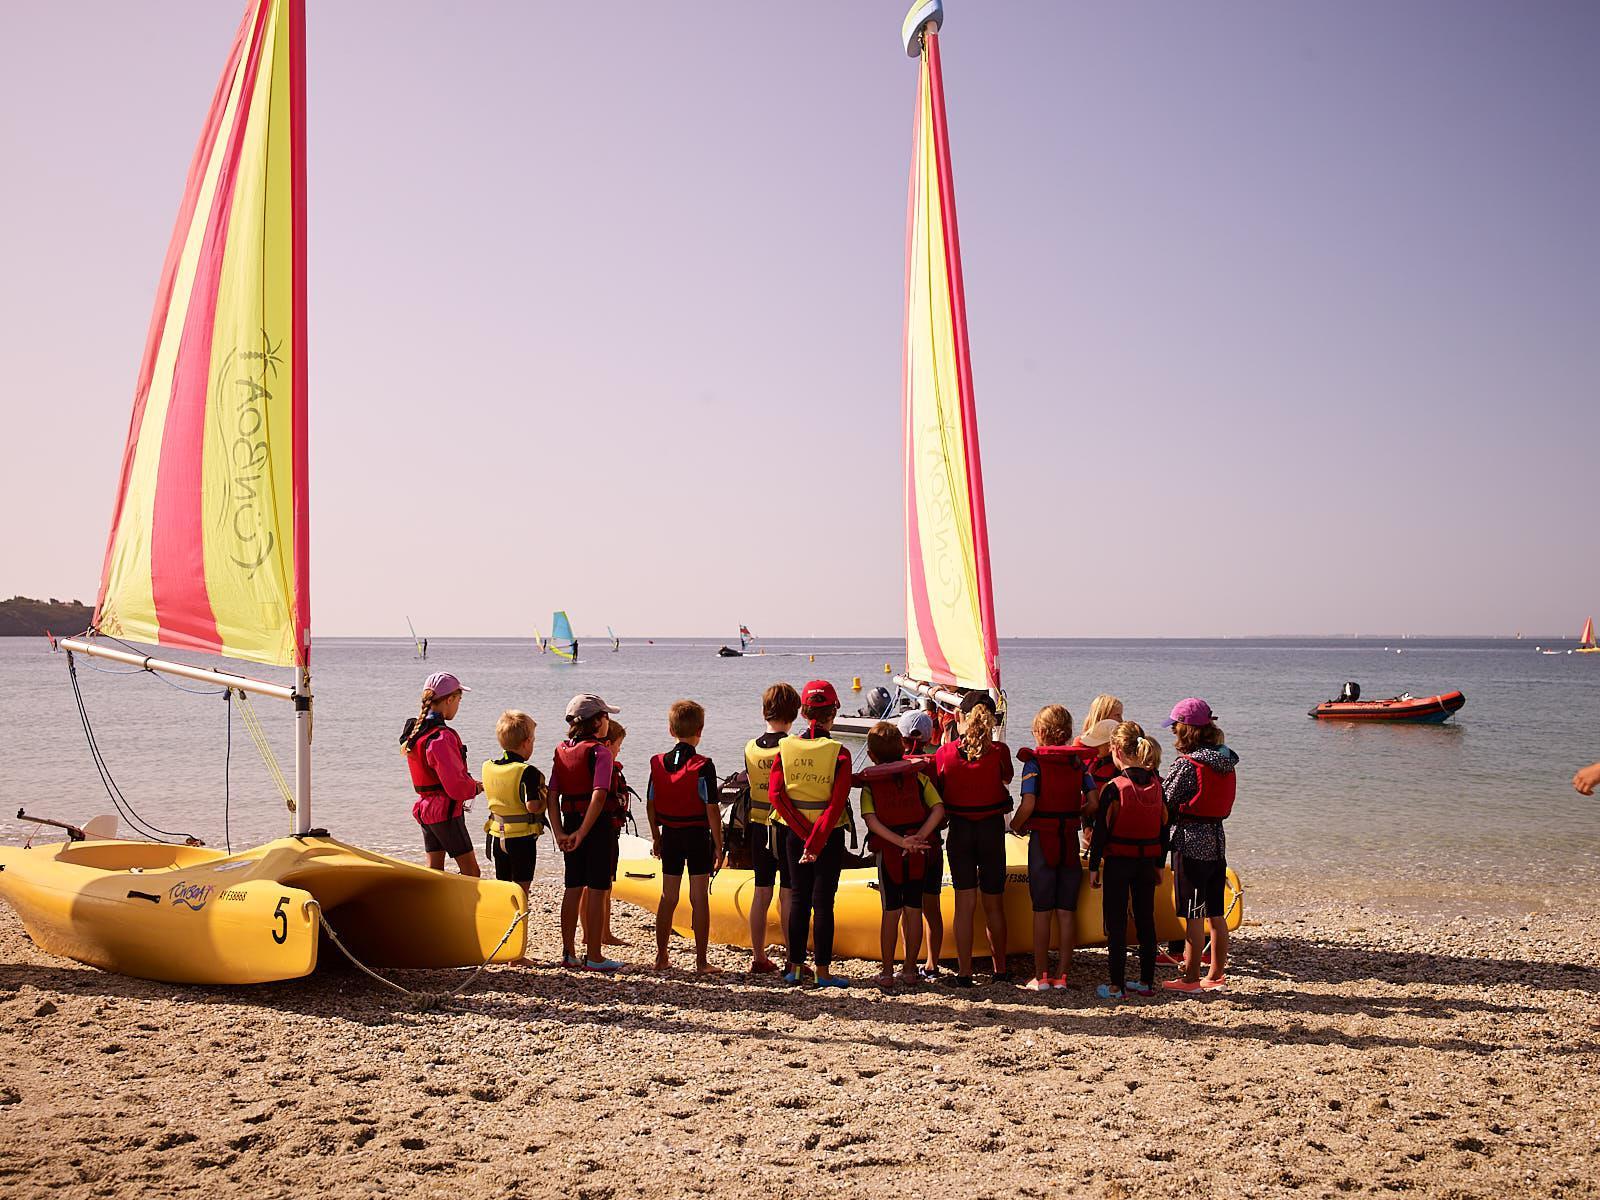 Club Nautique du Rohu - Briefing before starting